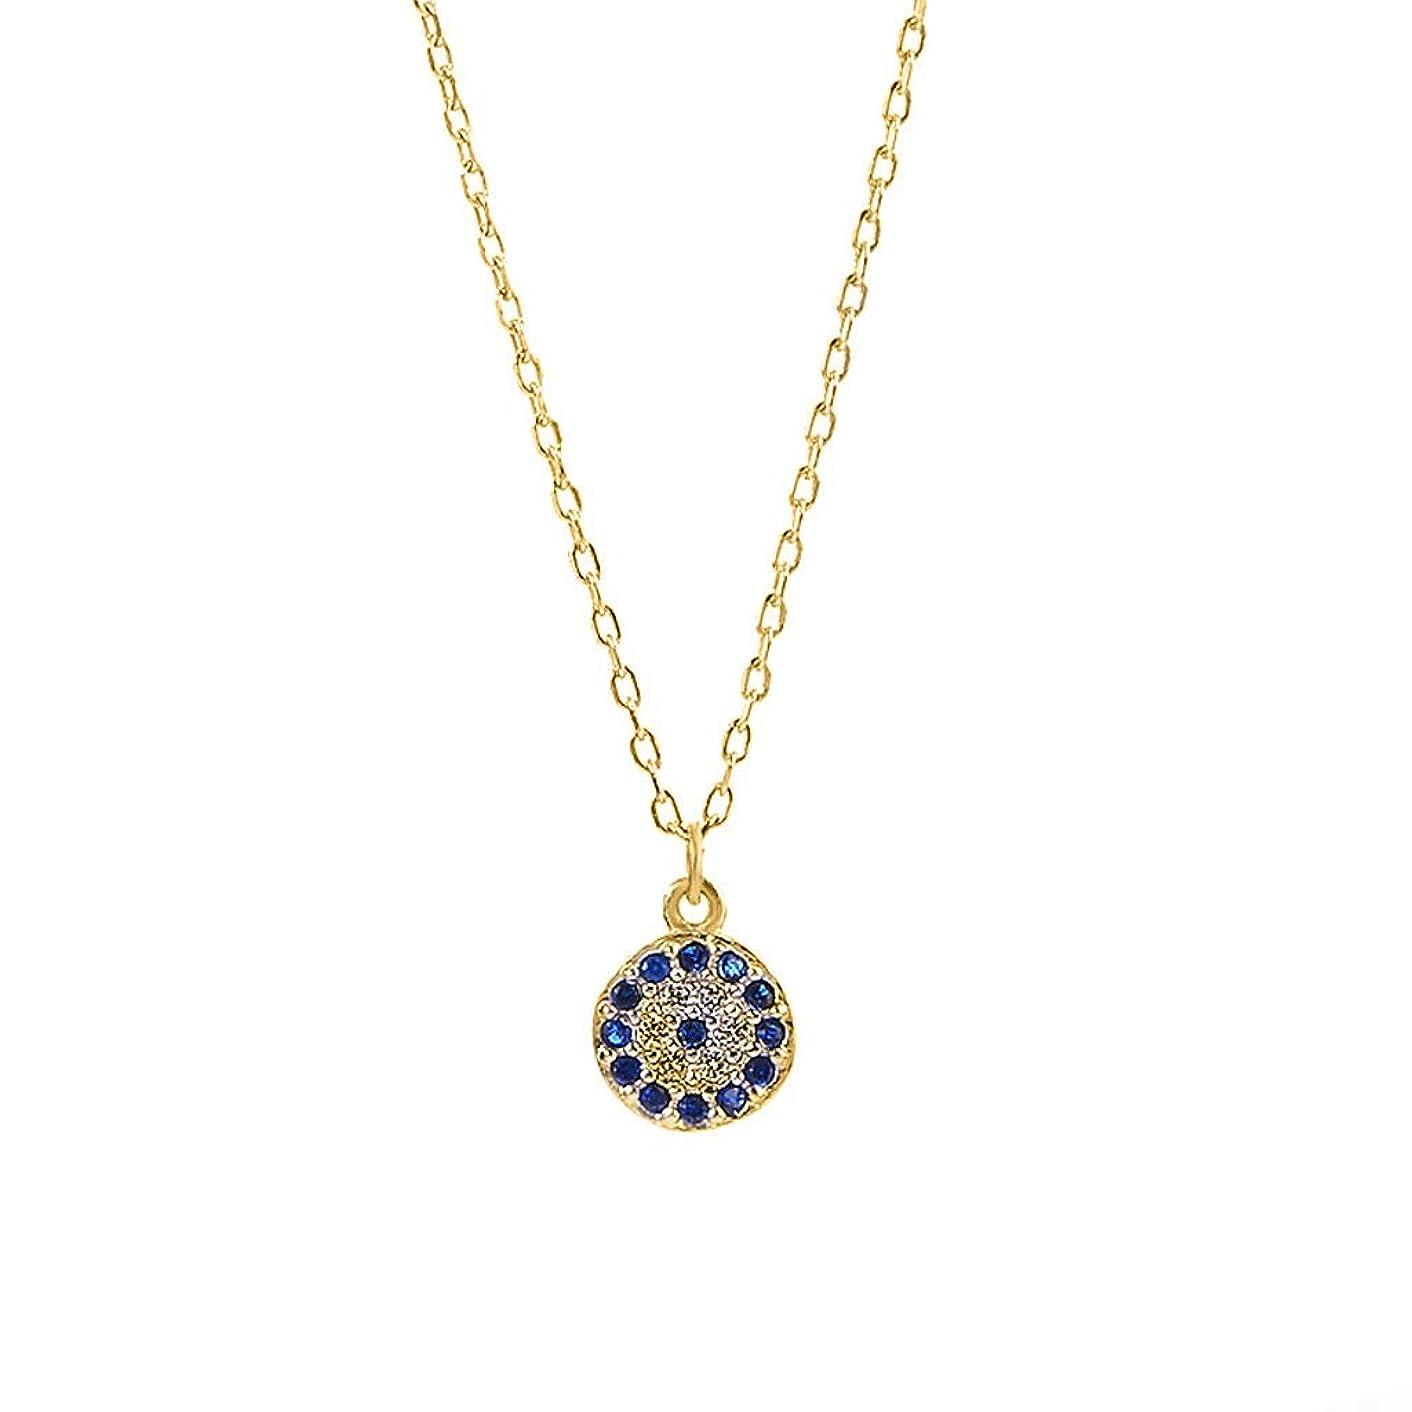 liumiKK CZ Small Evil Turkish Eye Pendant Necklace Blue Crystal Eye Choker Lucky Jewelry